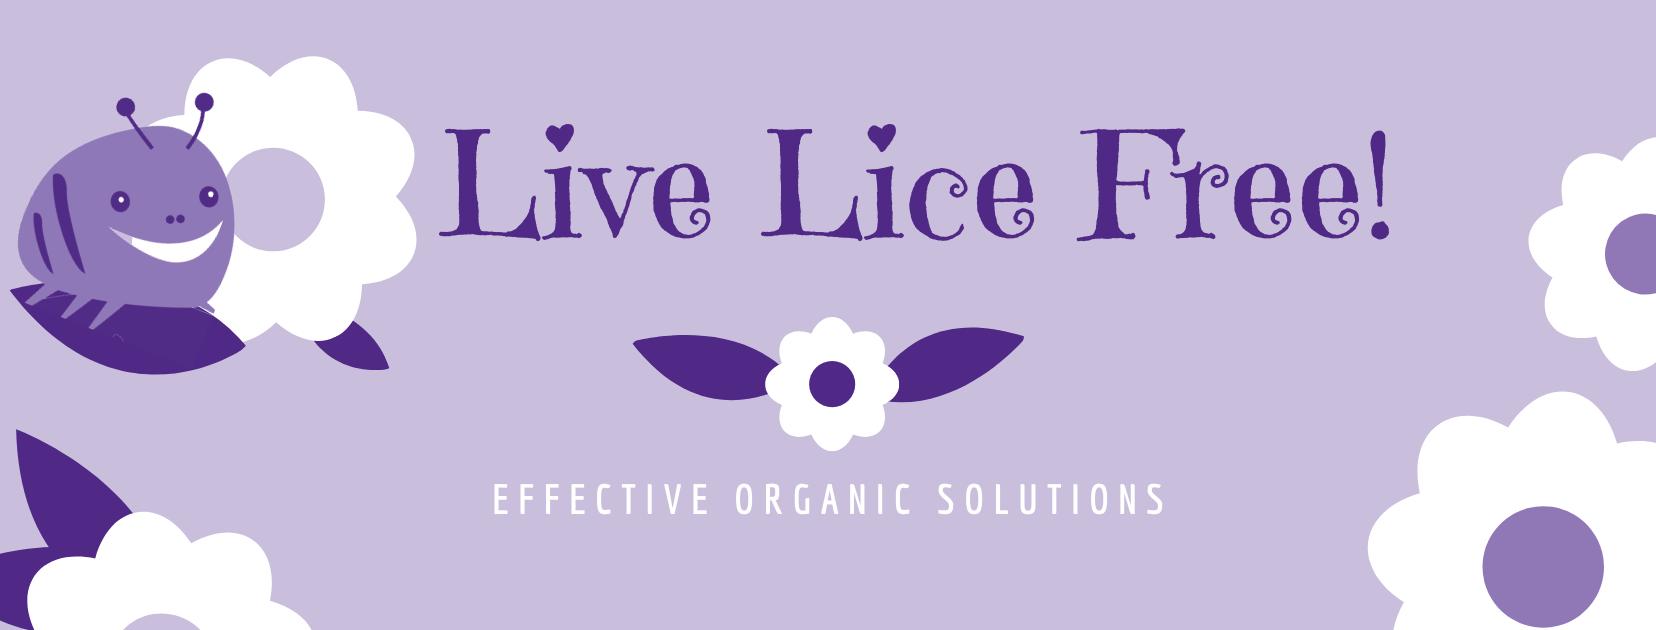 live lice free